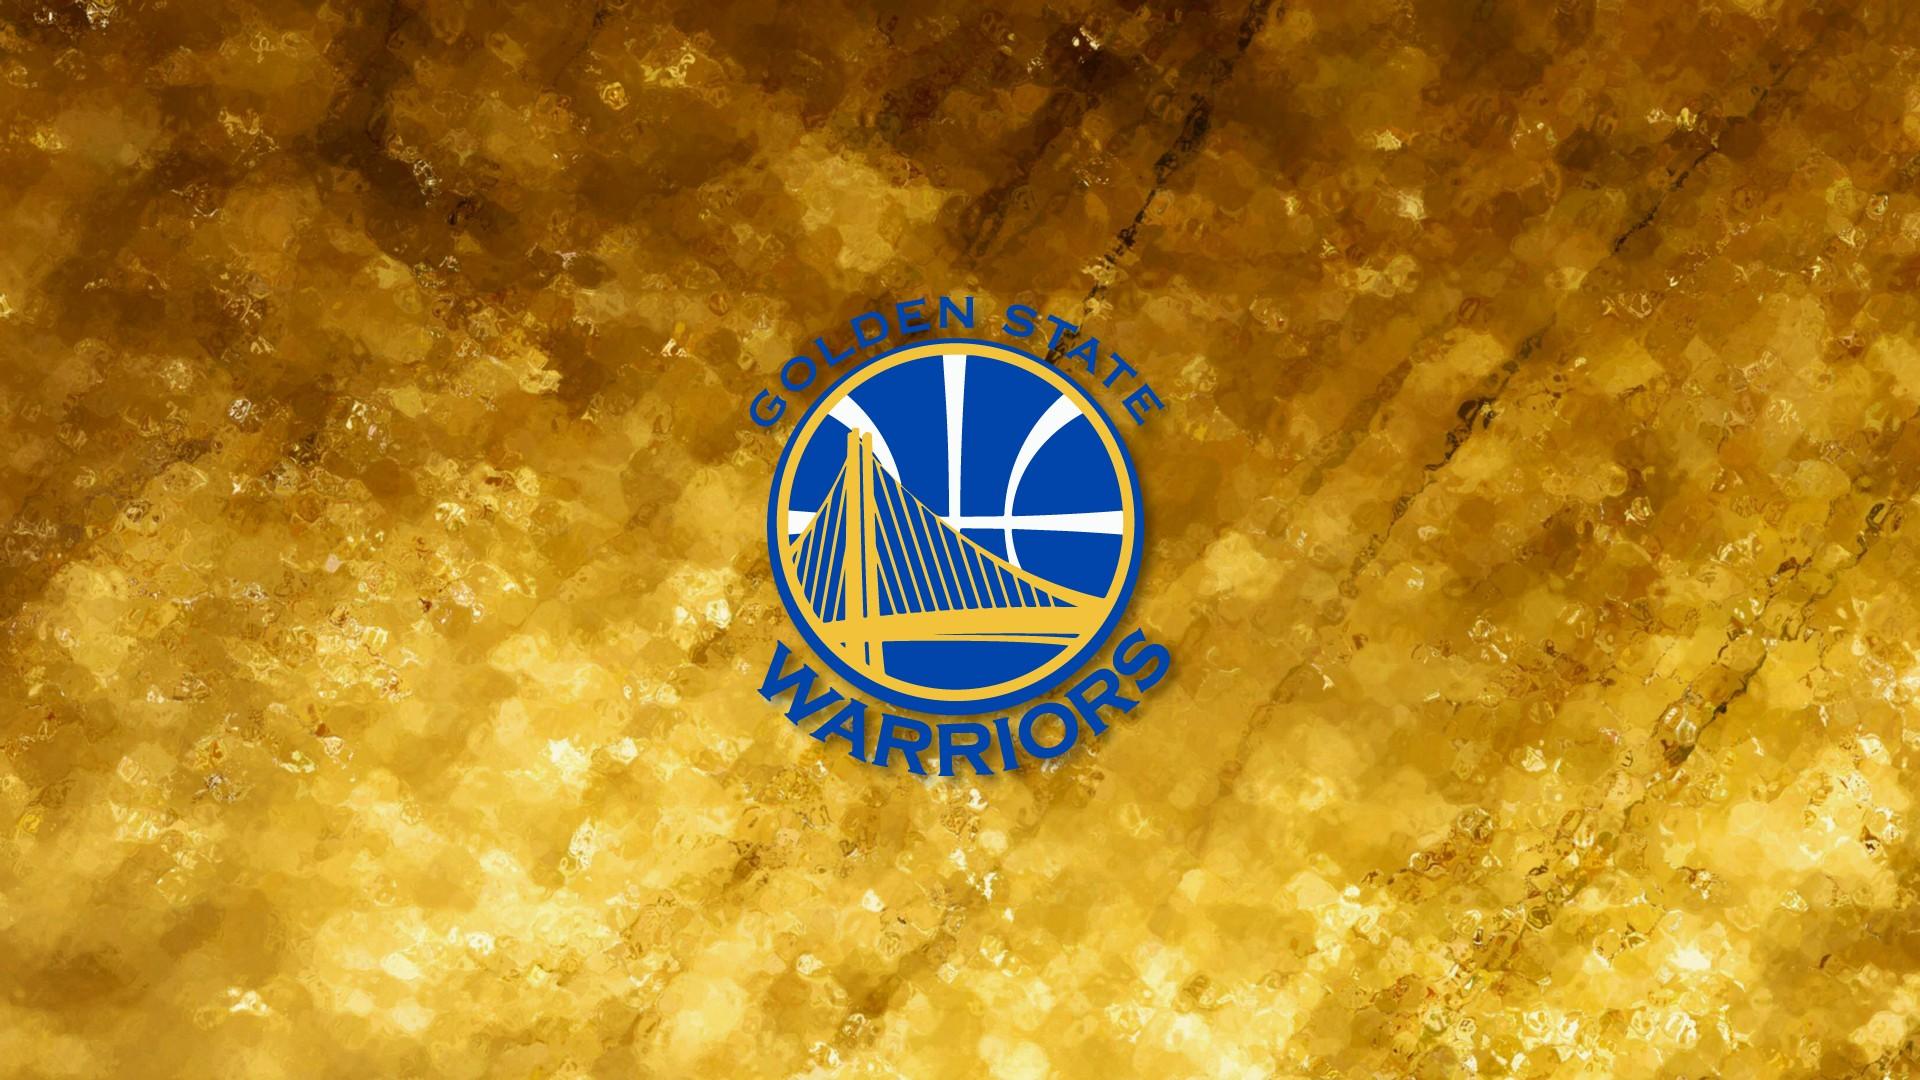 Golden State Warriors Wallpaper Iphone Best Golden State Warriors Wallpaper 2019 Cute Wallpapers